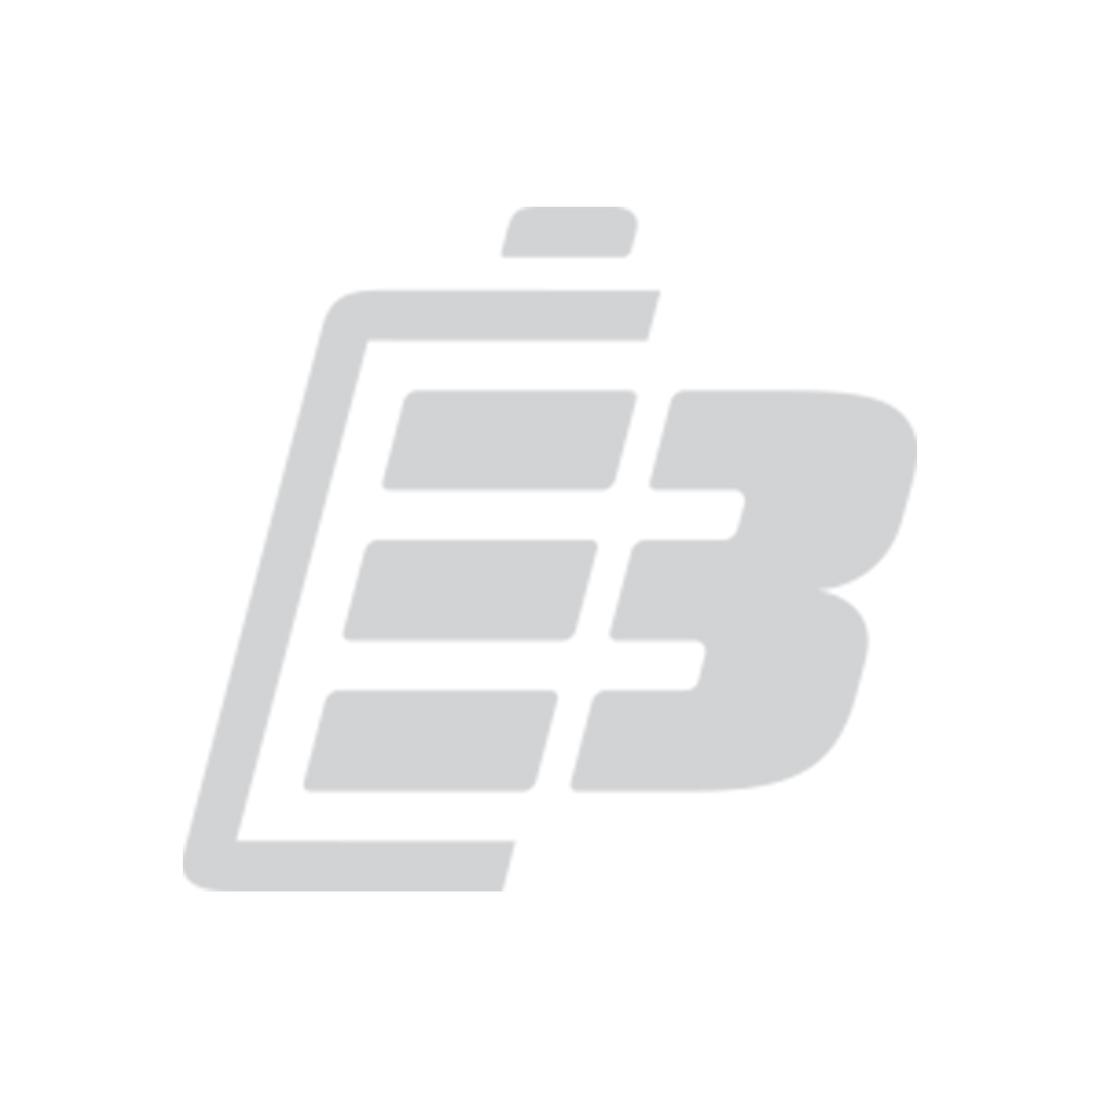 MP3 battery Apple iPod Nano 5th generation_1